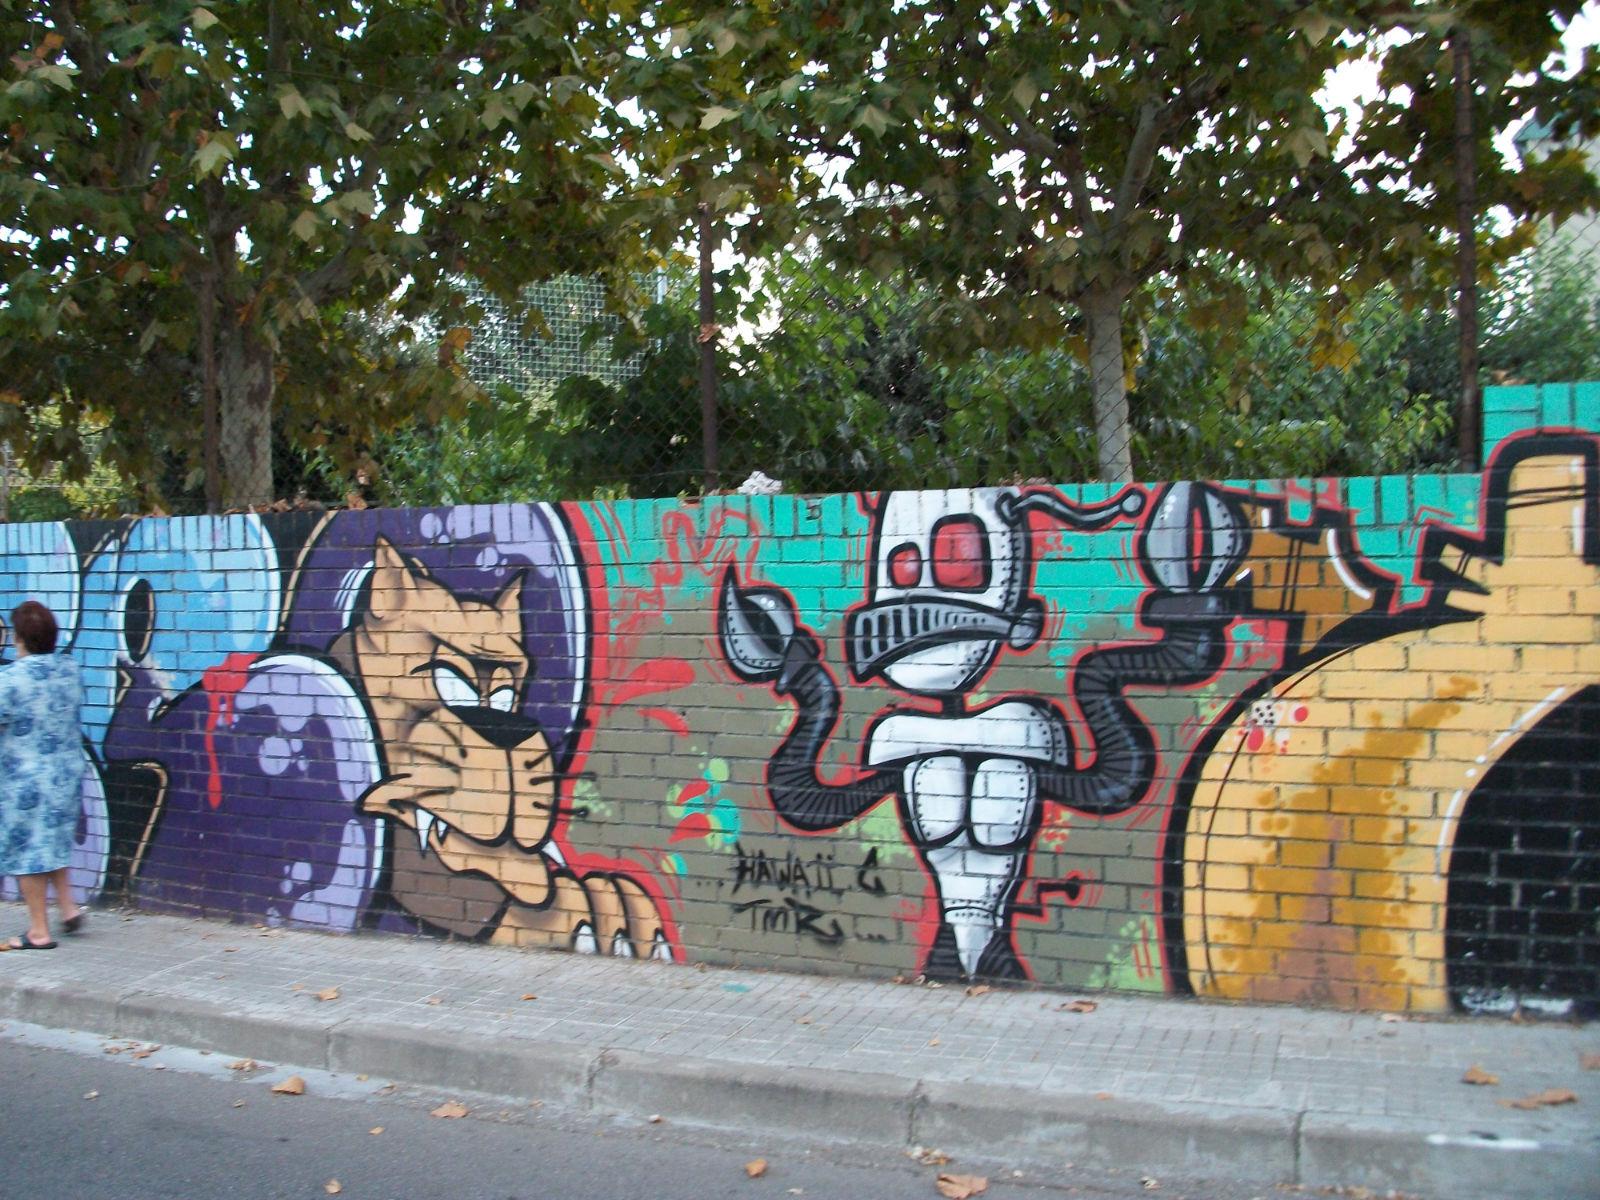 Graffitis arte callejero el blog de catalina for Graffitis y murales callejeros